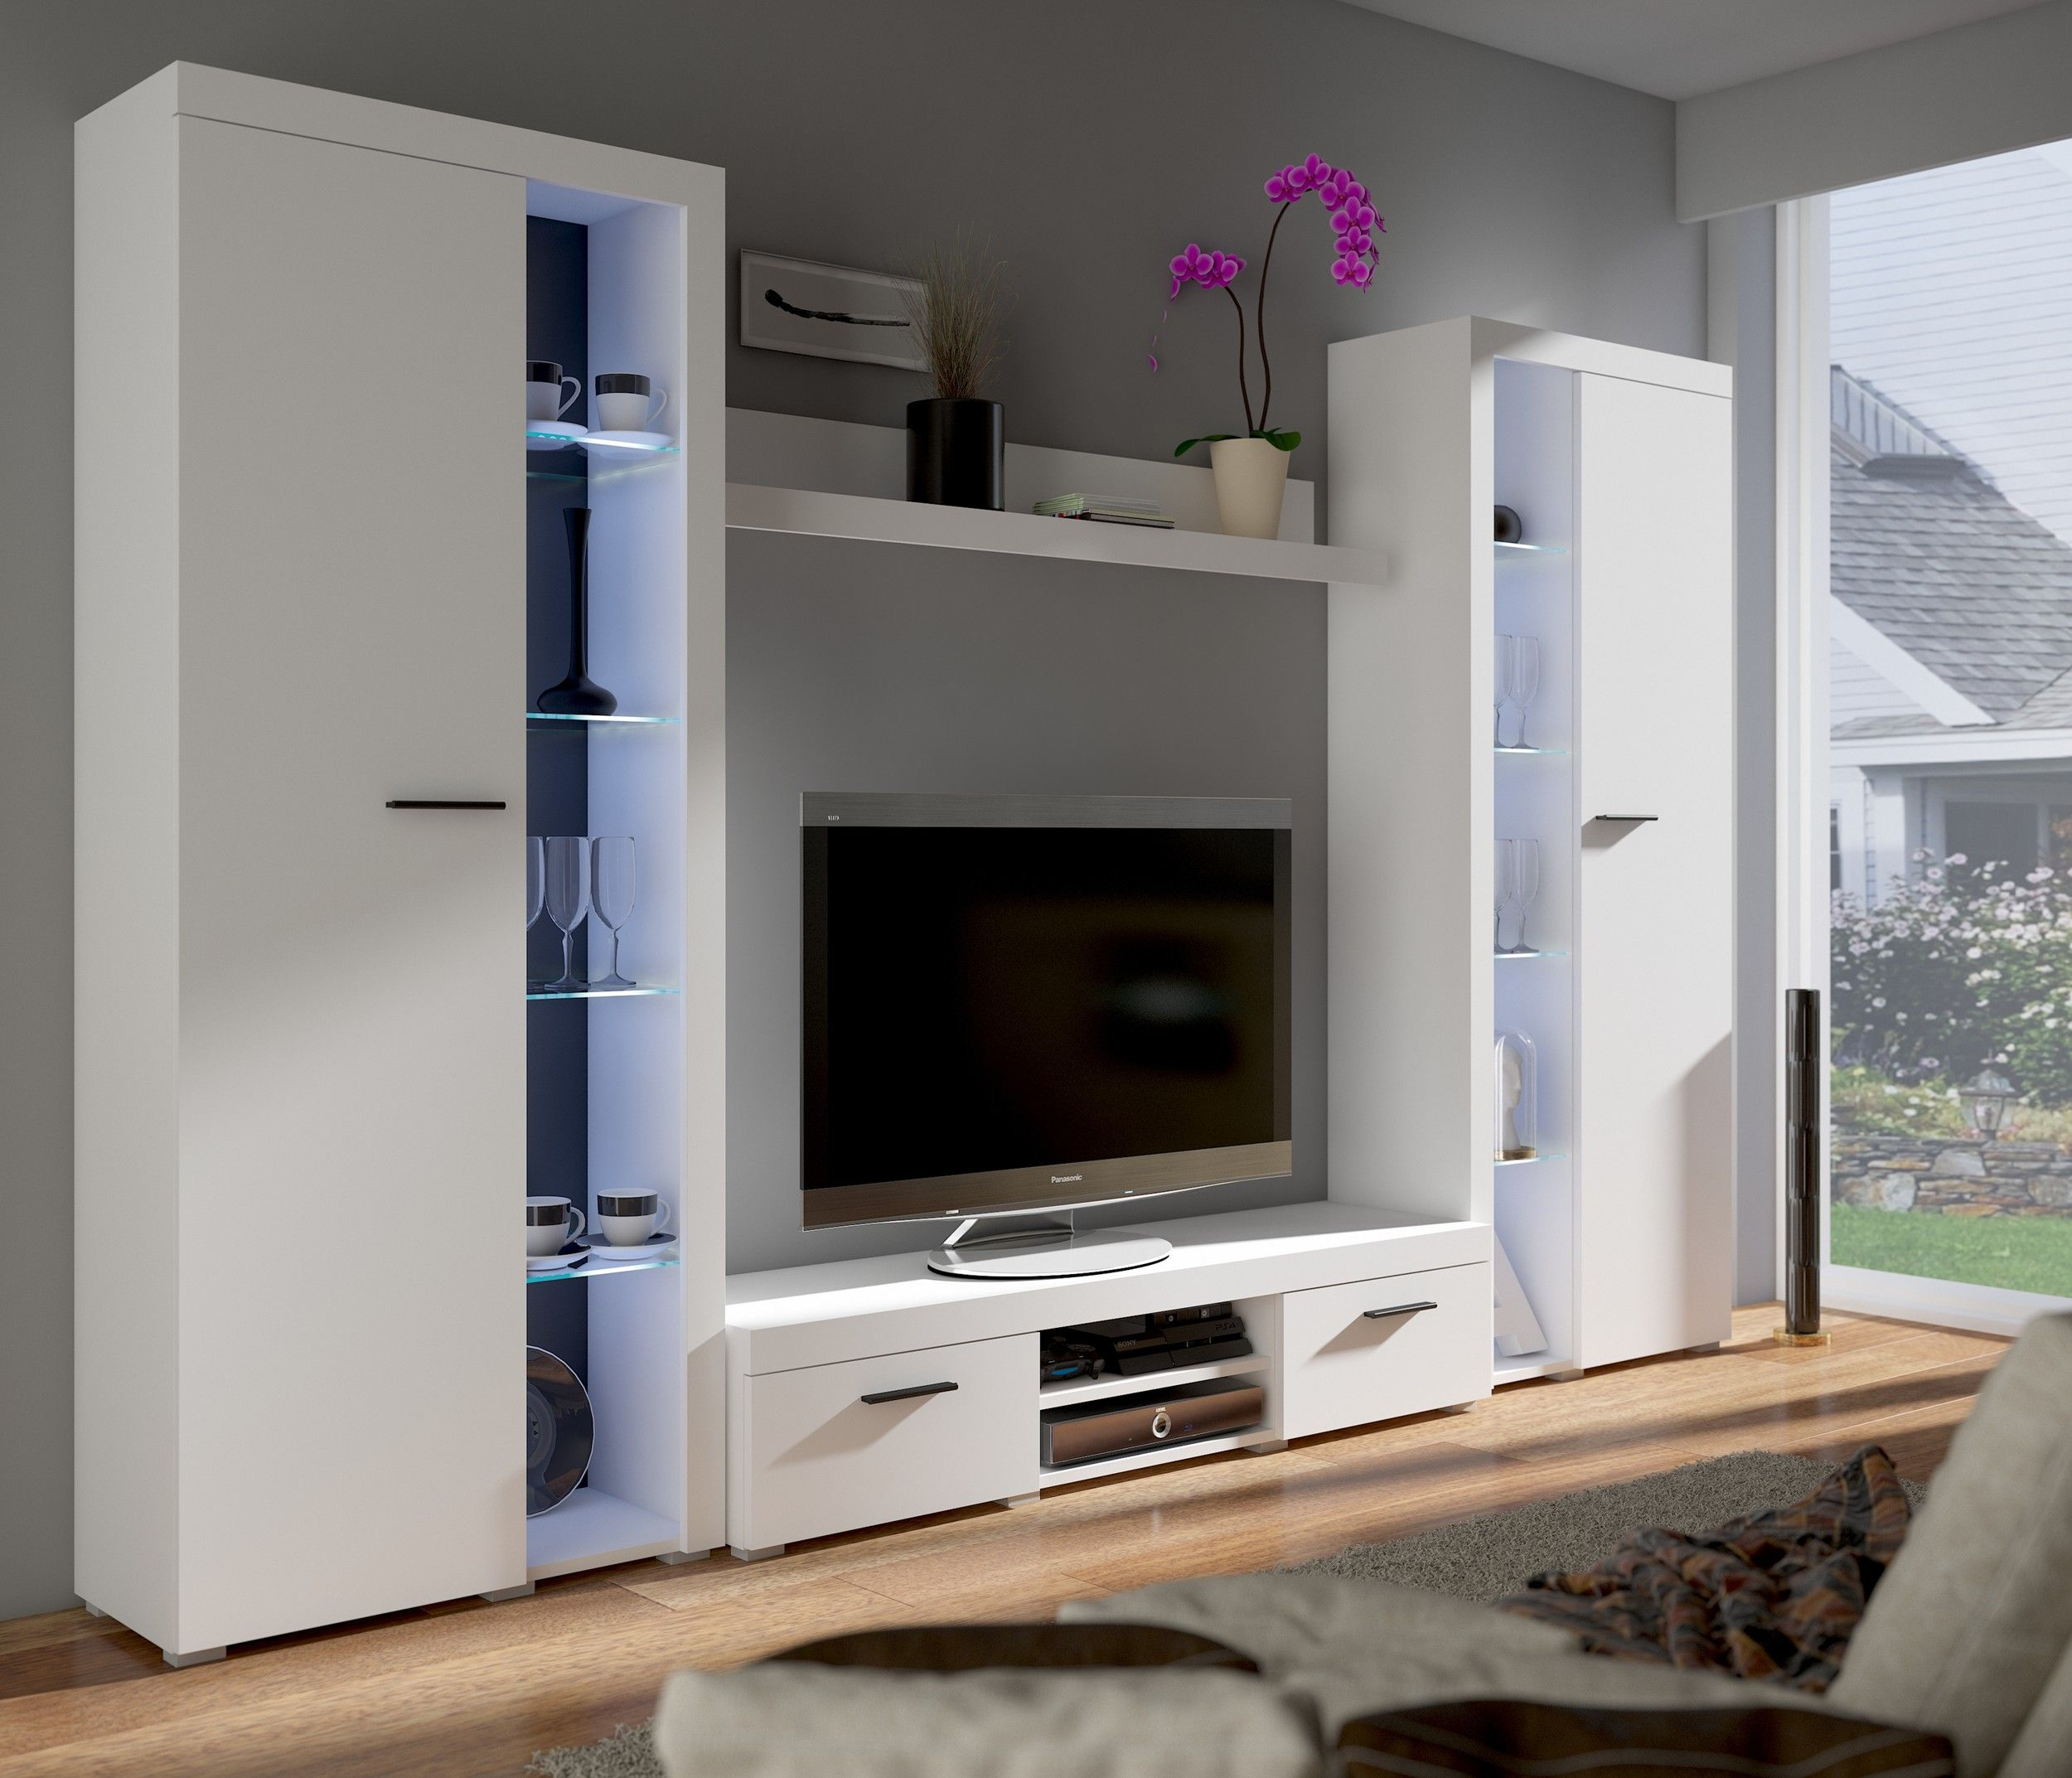 top wohnwand rumba xl anbauwand wohnkombi wohnzimmer weiss matt wohnw nde. Black Bedroom Furniture Sets. Home Design Ideas